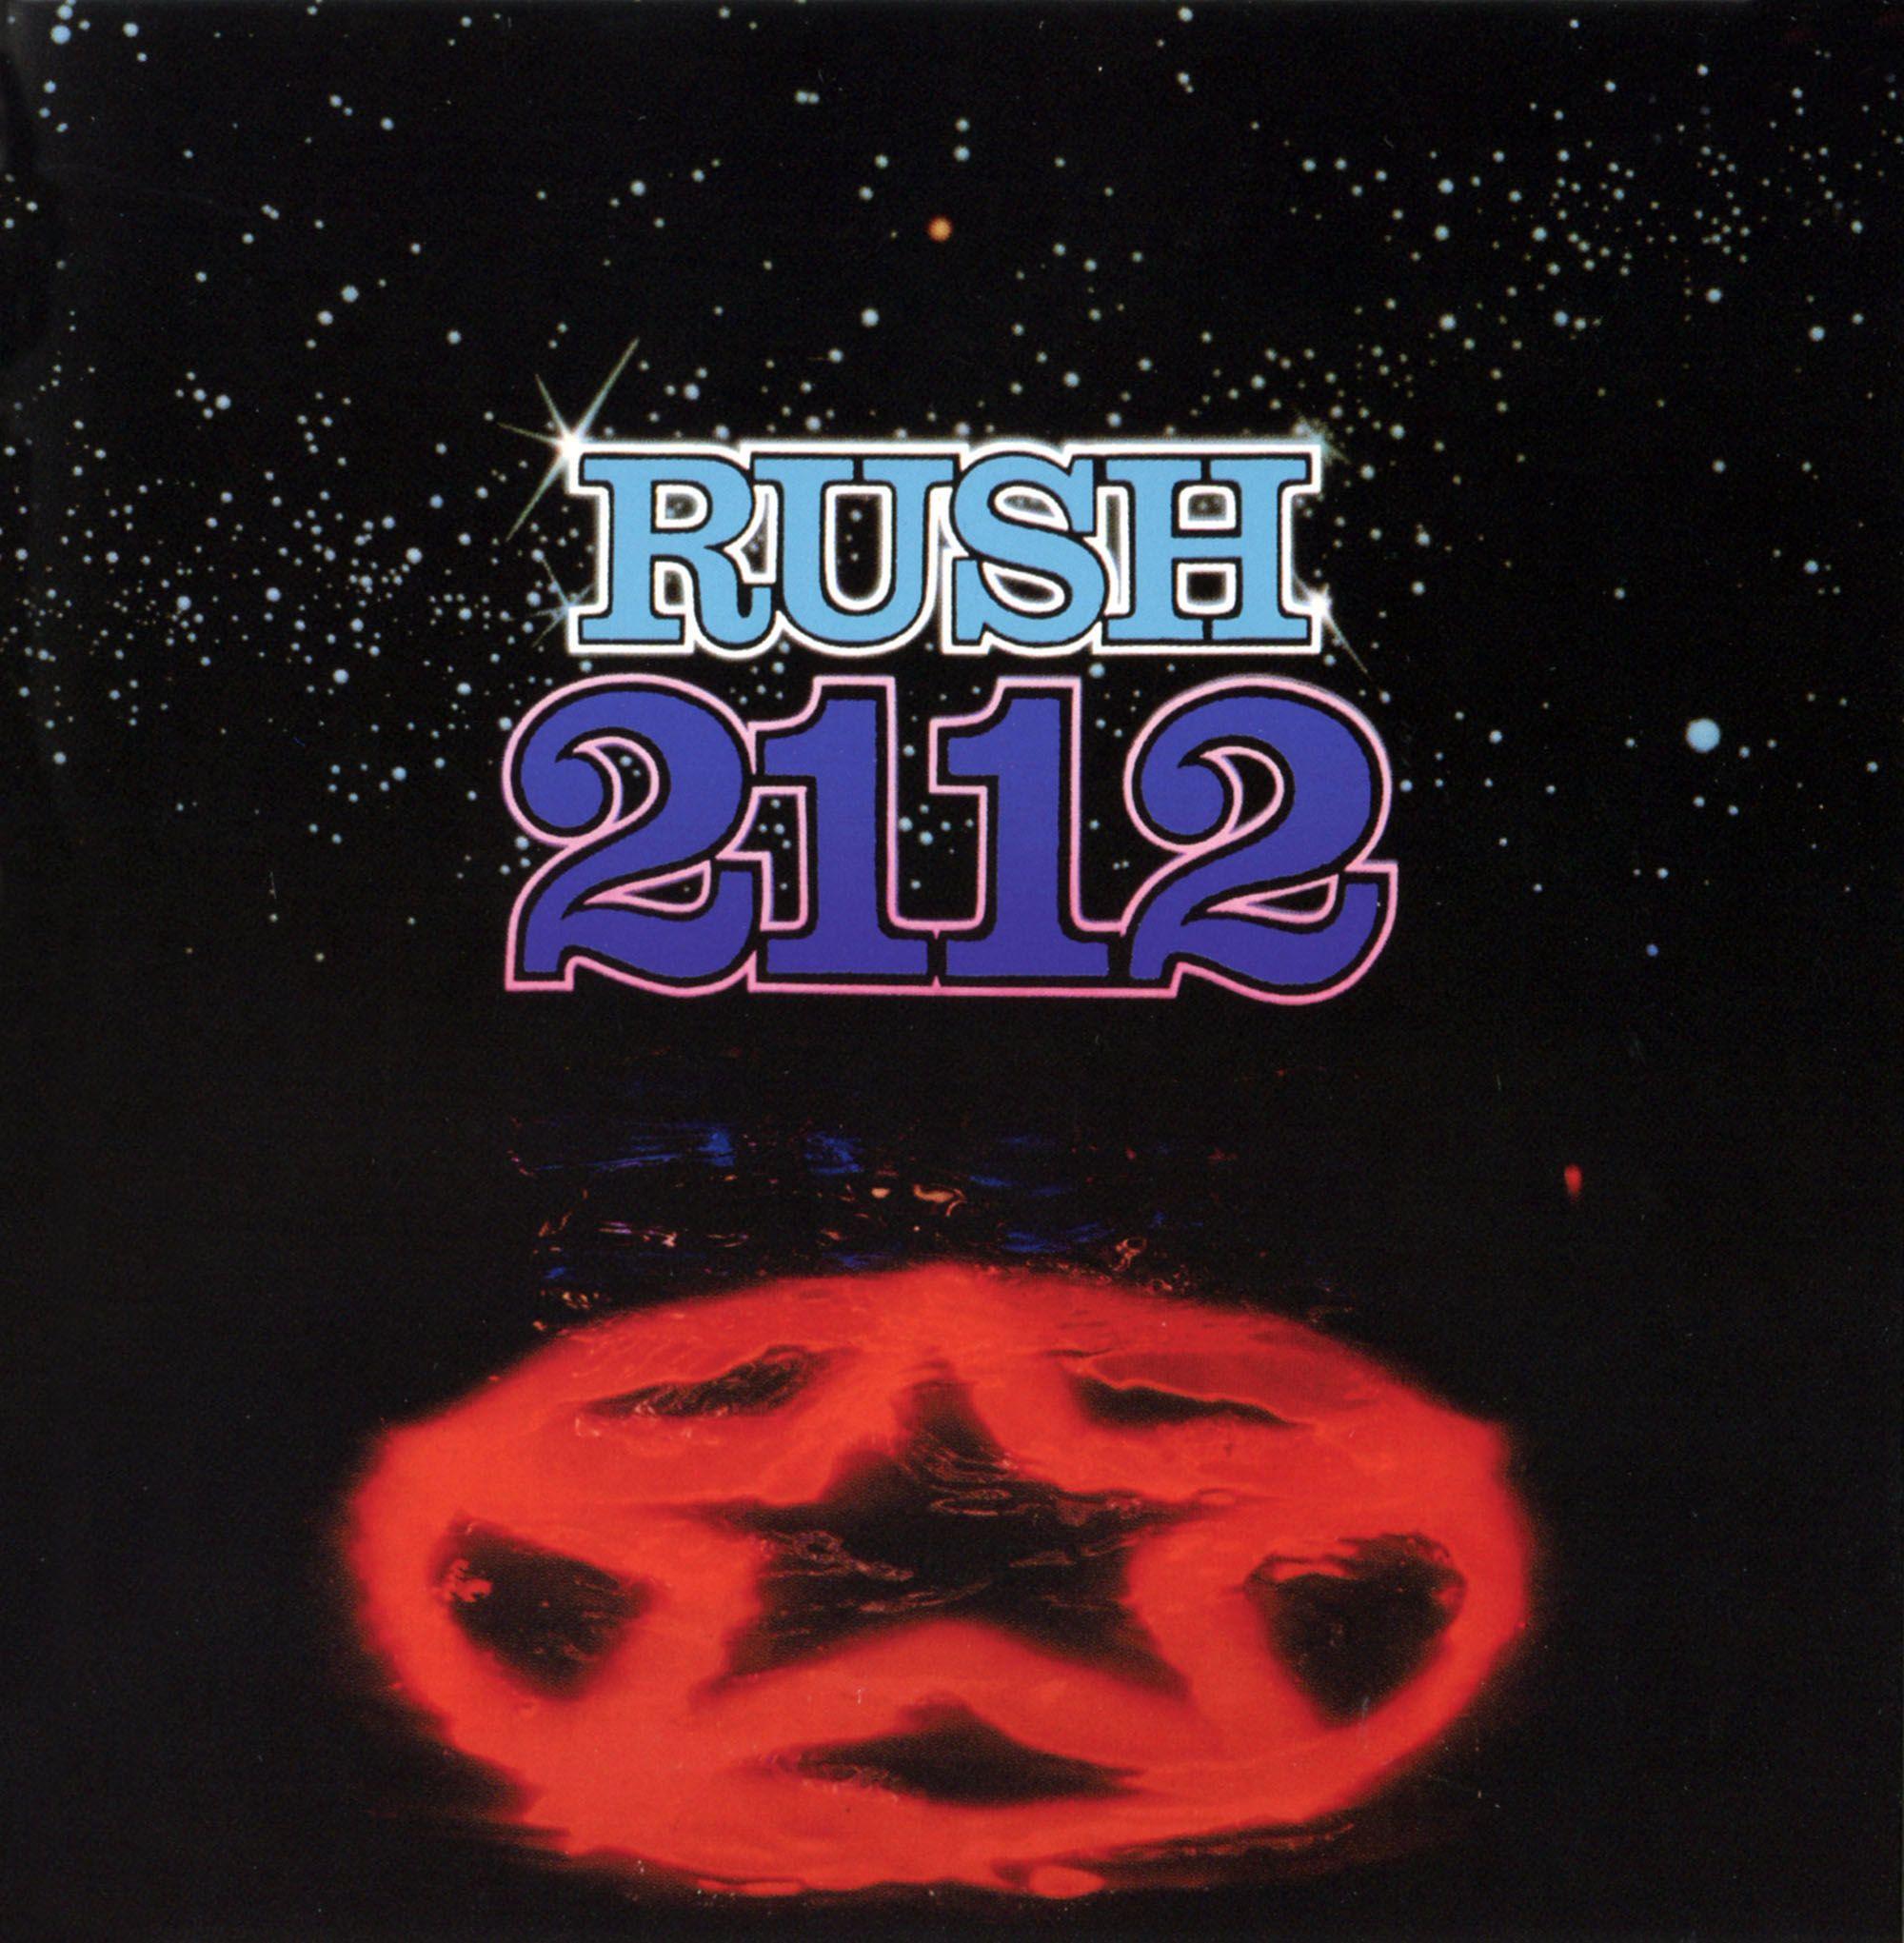 Rush Album Cover Art 2112 Album Artwork Click Any Image